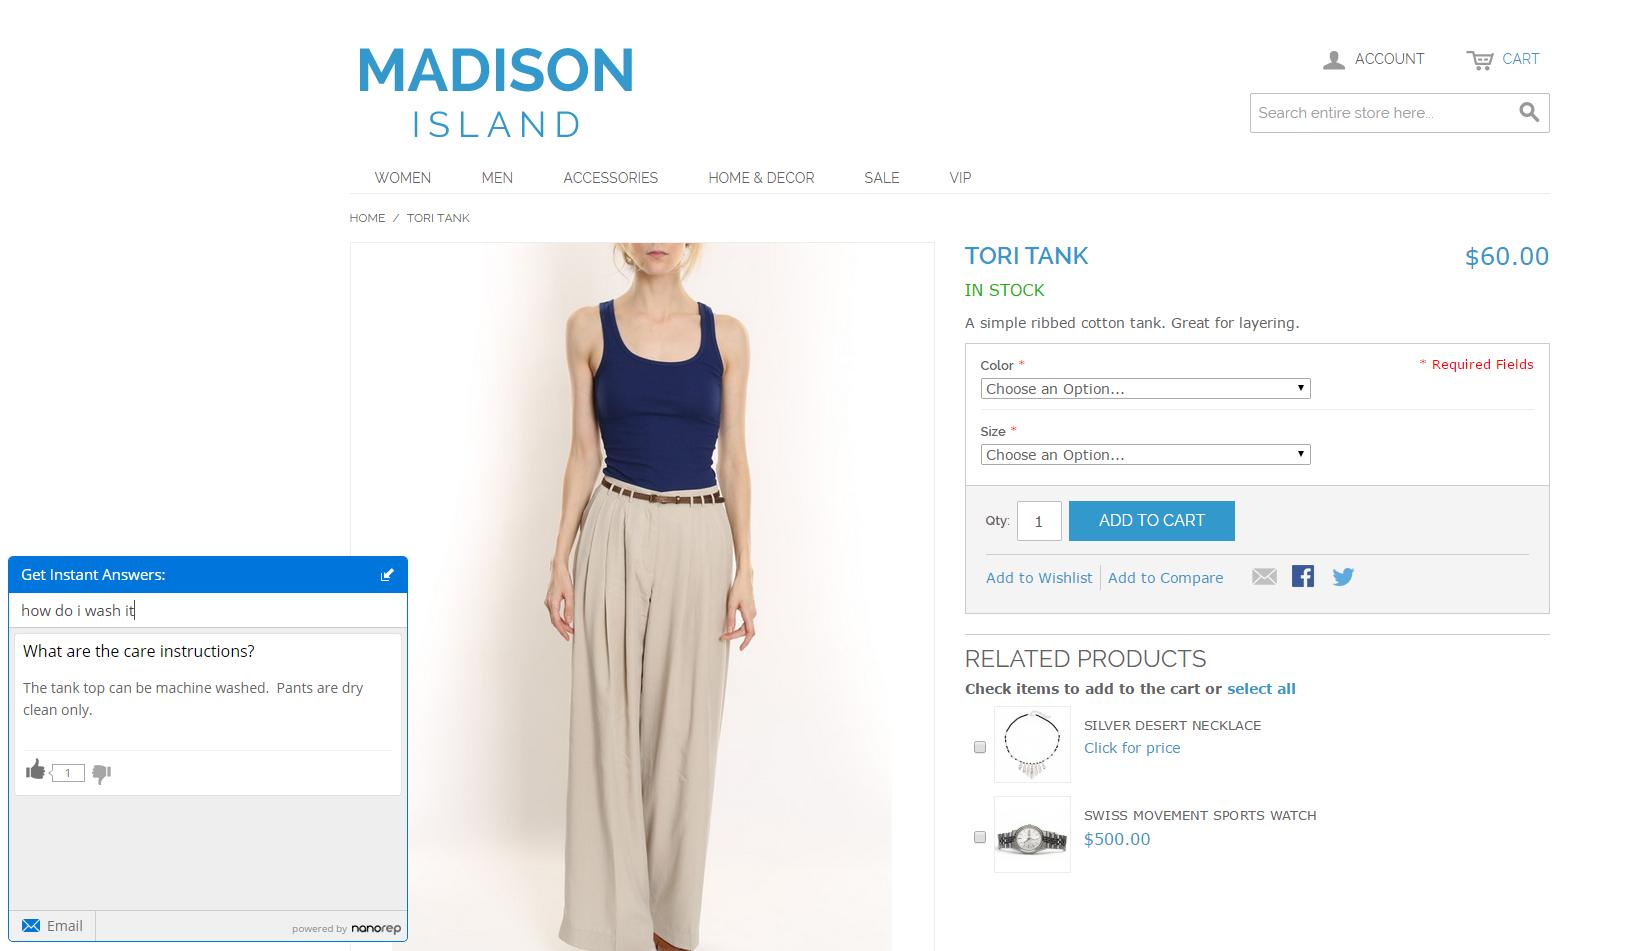 Customer facing Self-service widgets